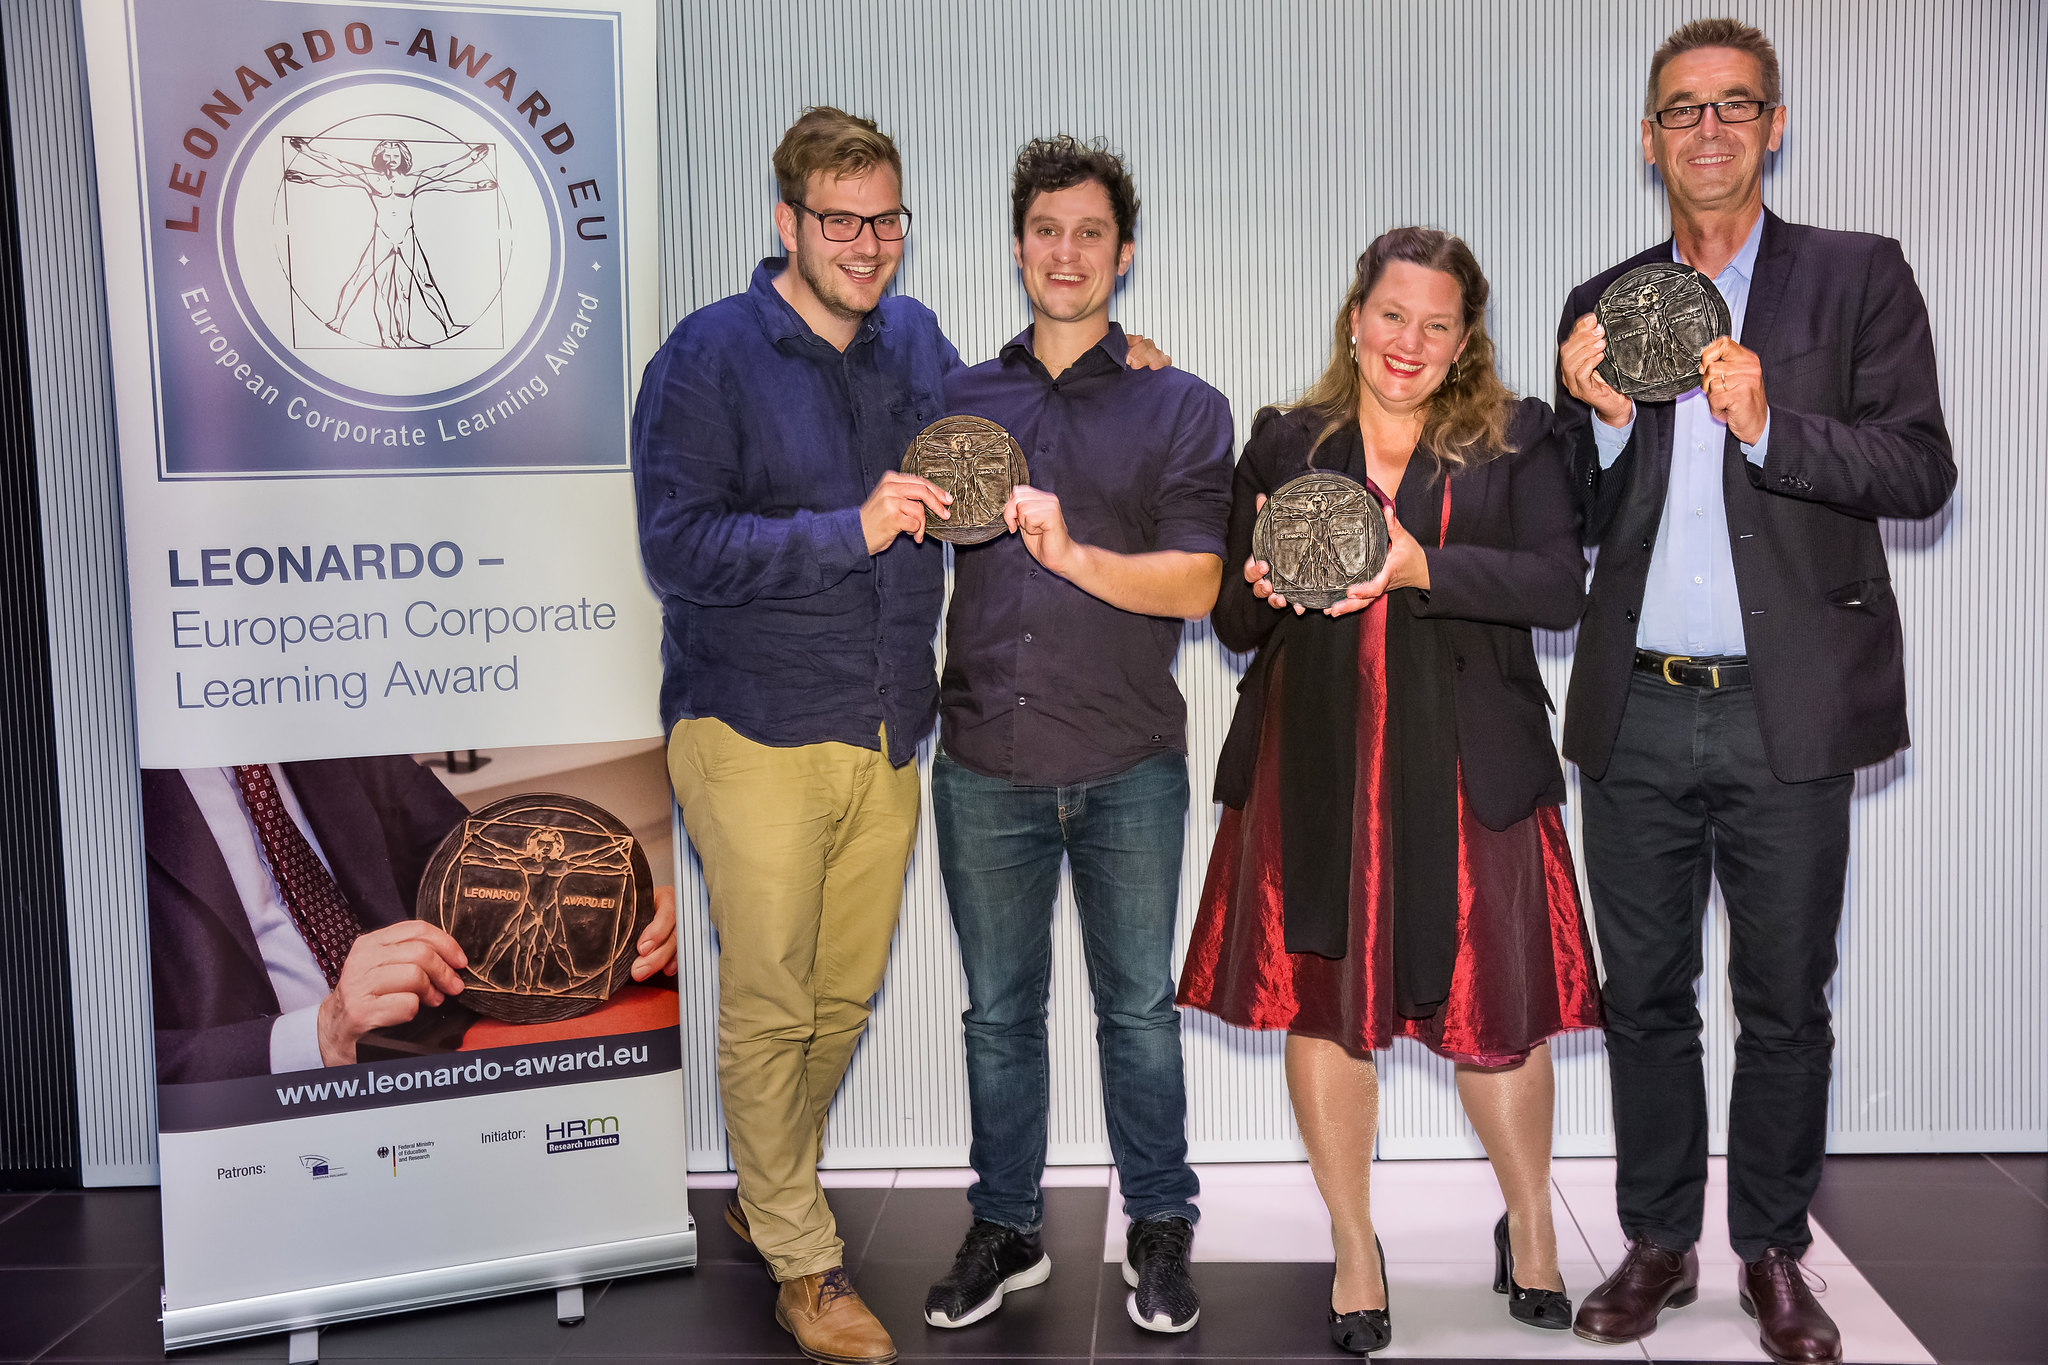 Leonardo Award 2016